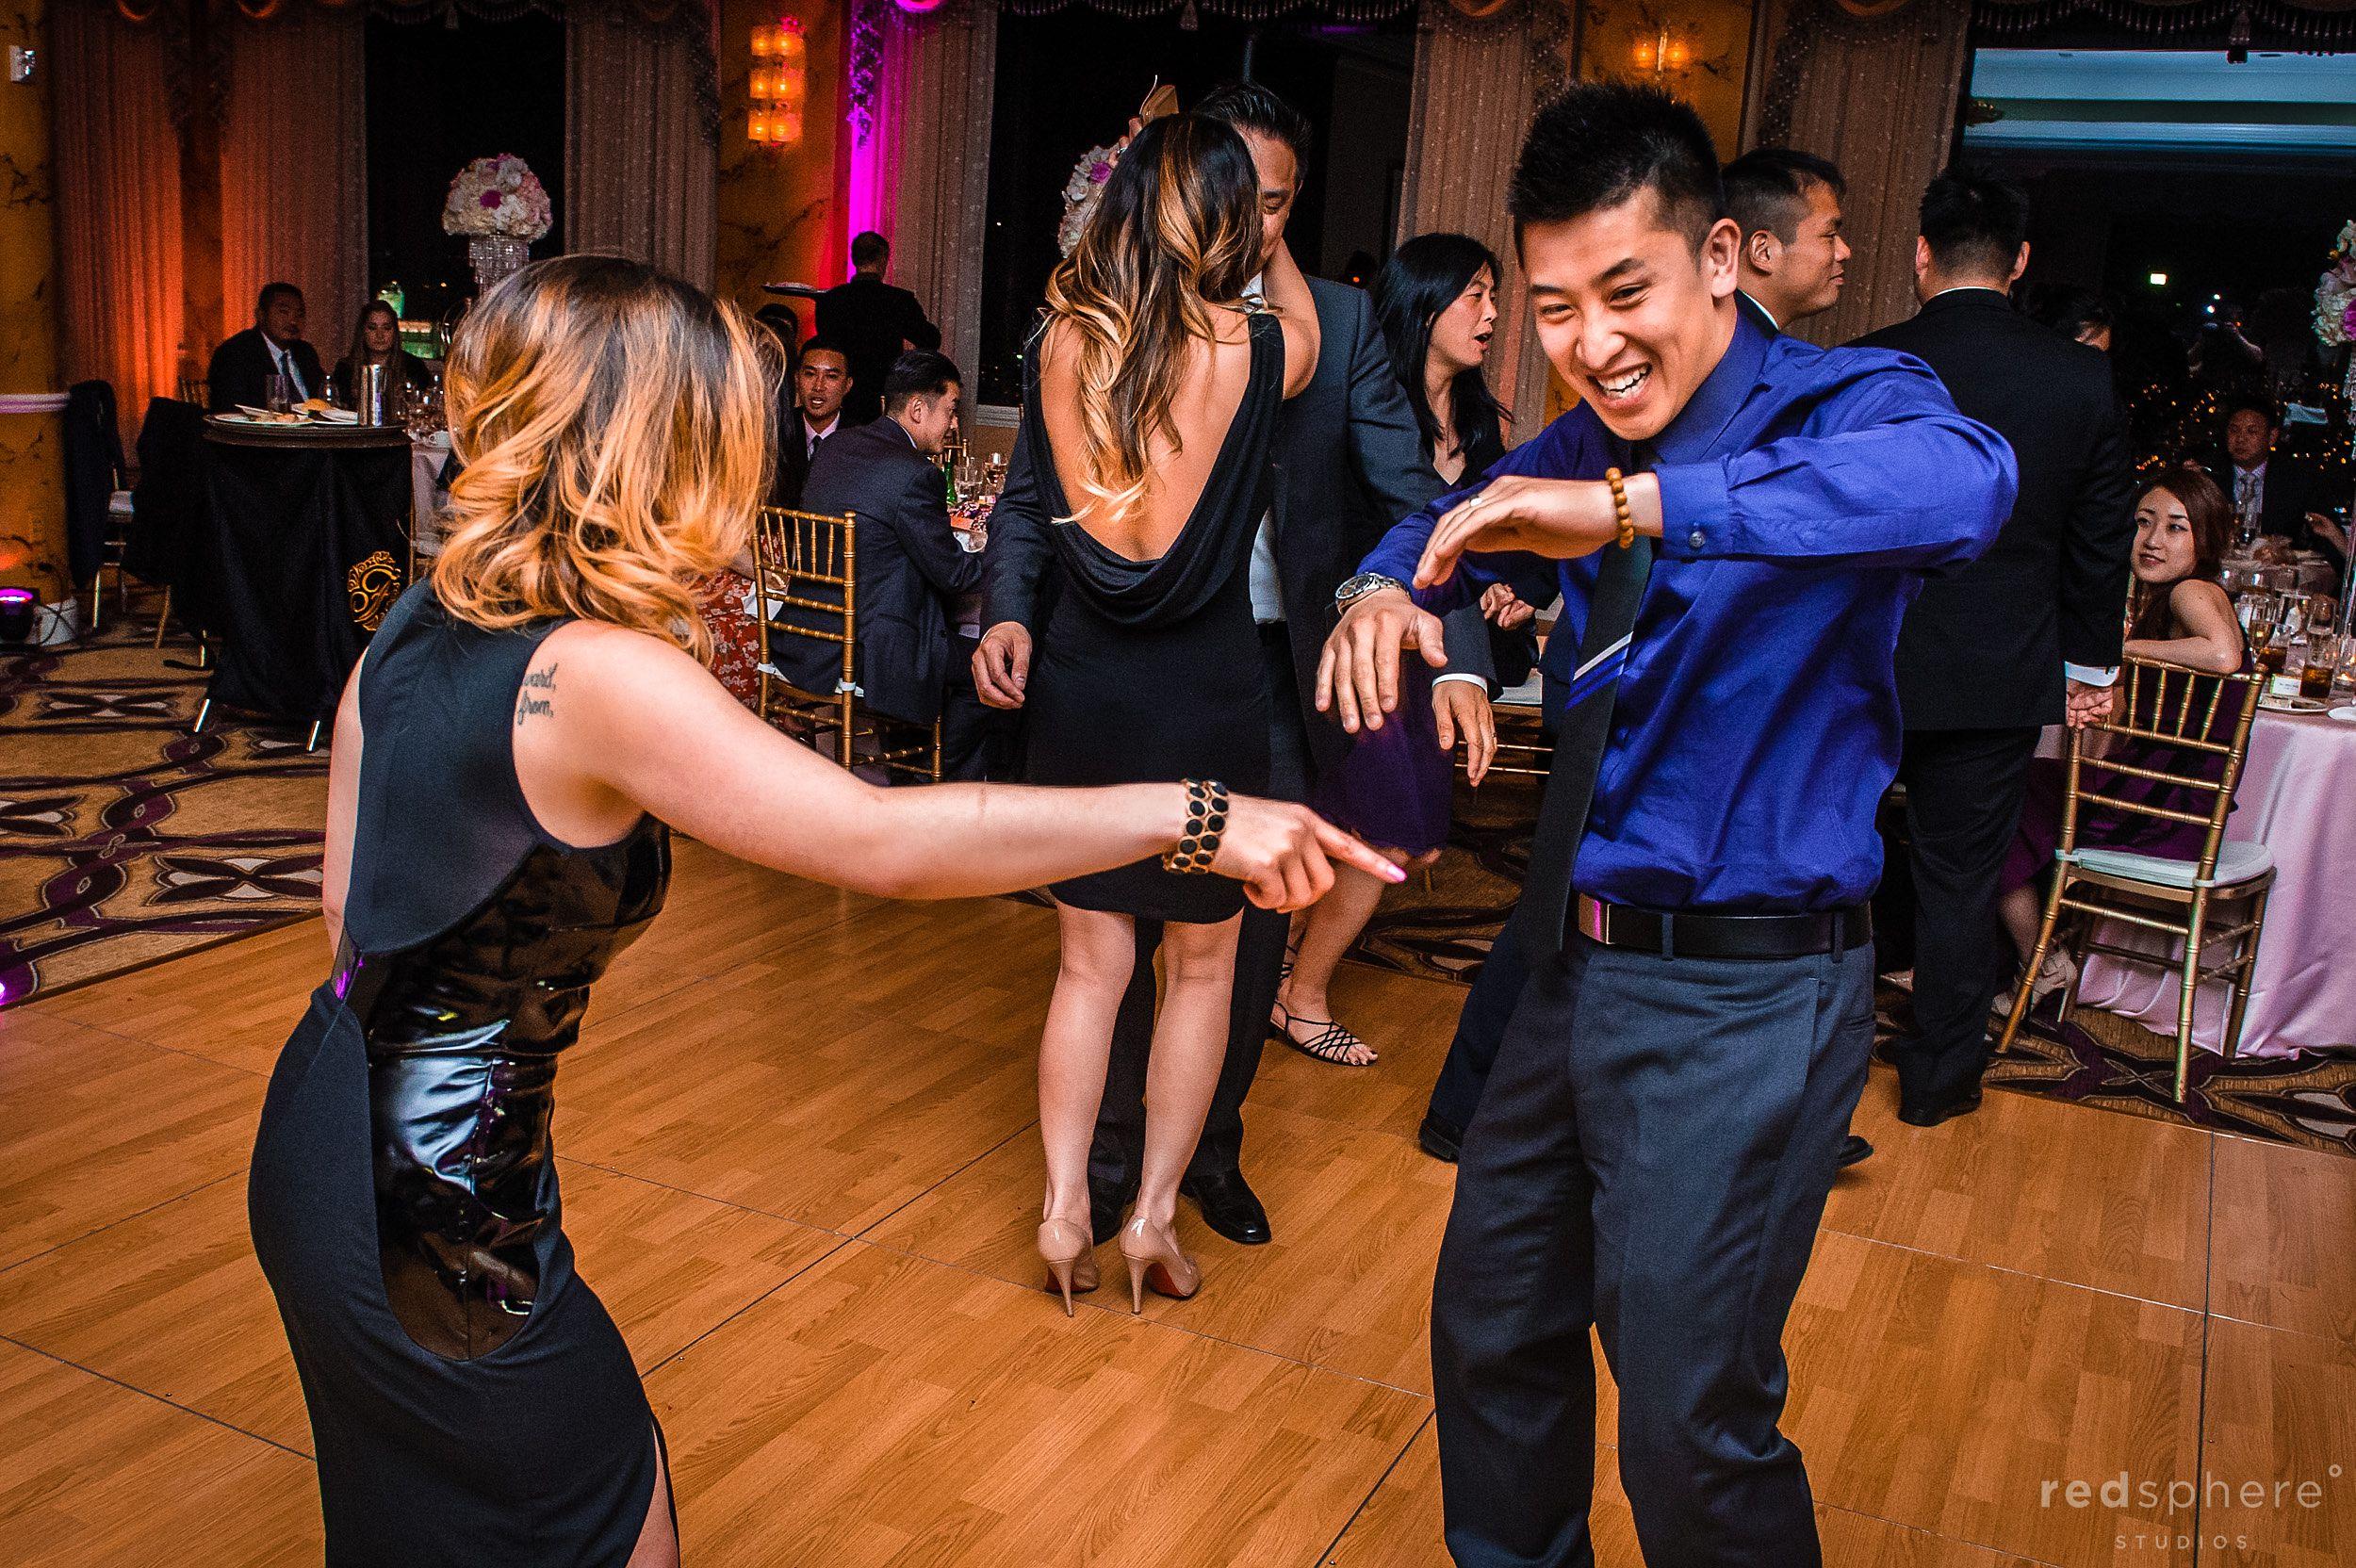 Friends Dancing at Fairmont Hotel